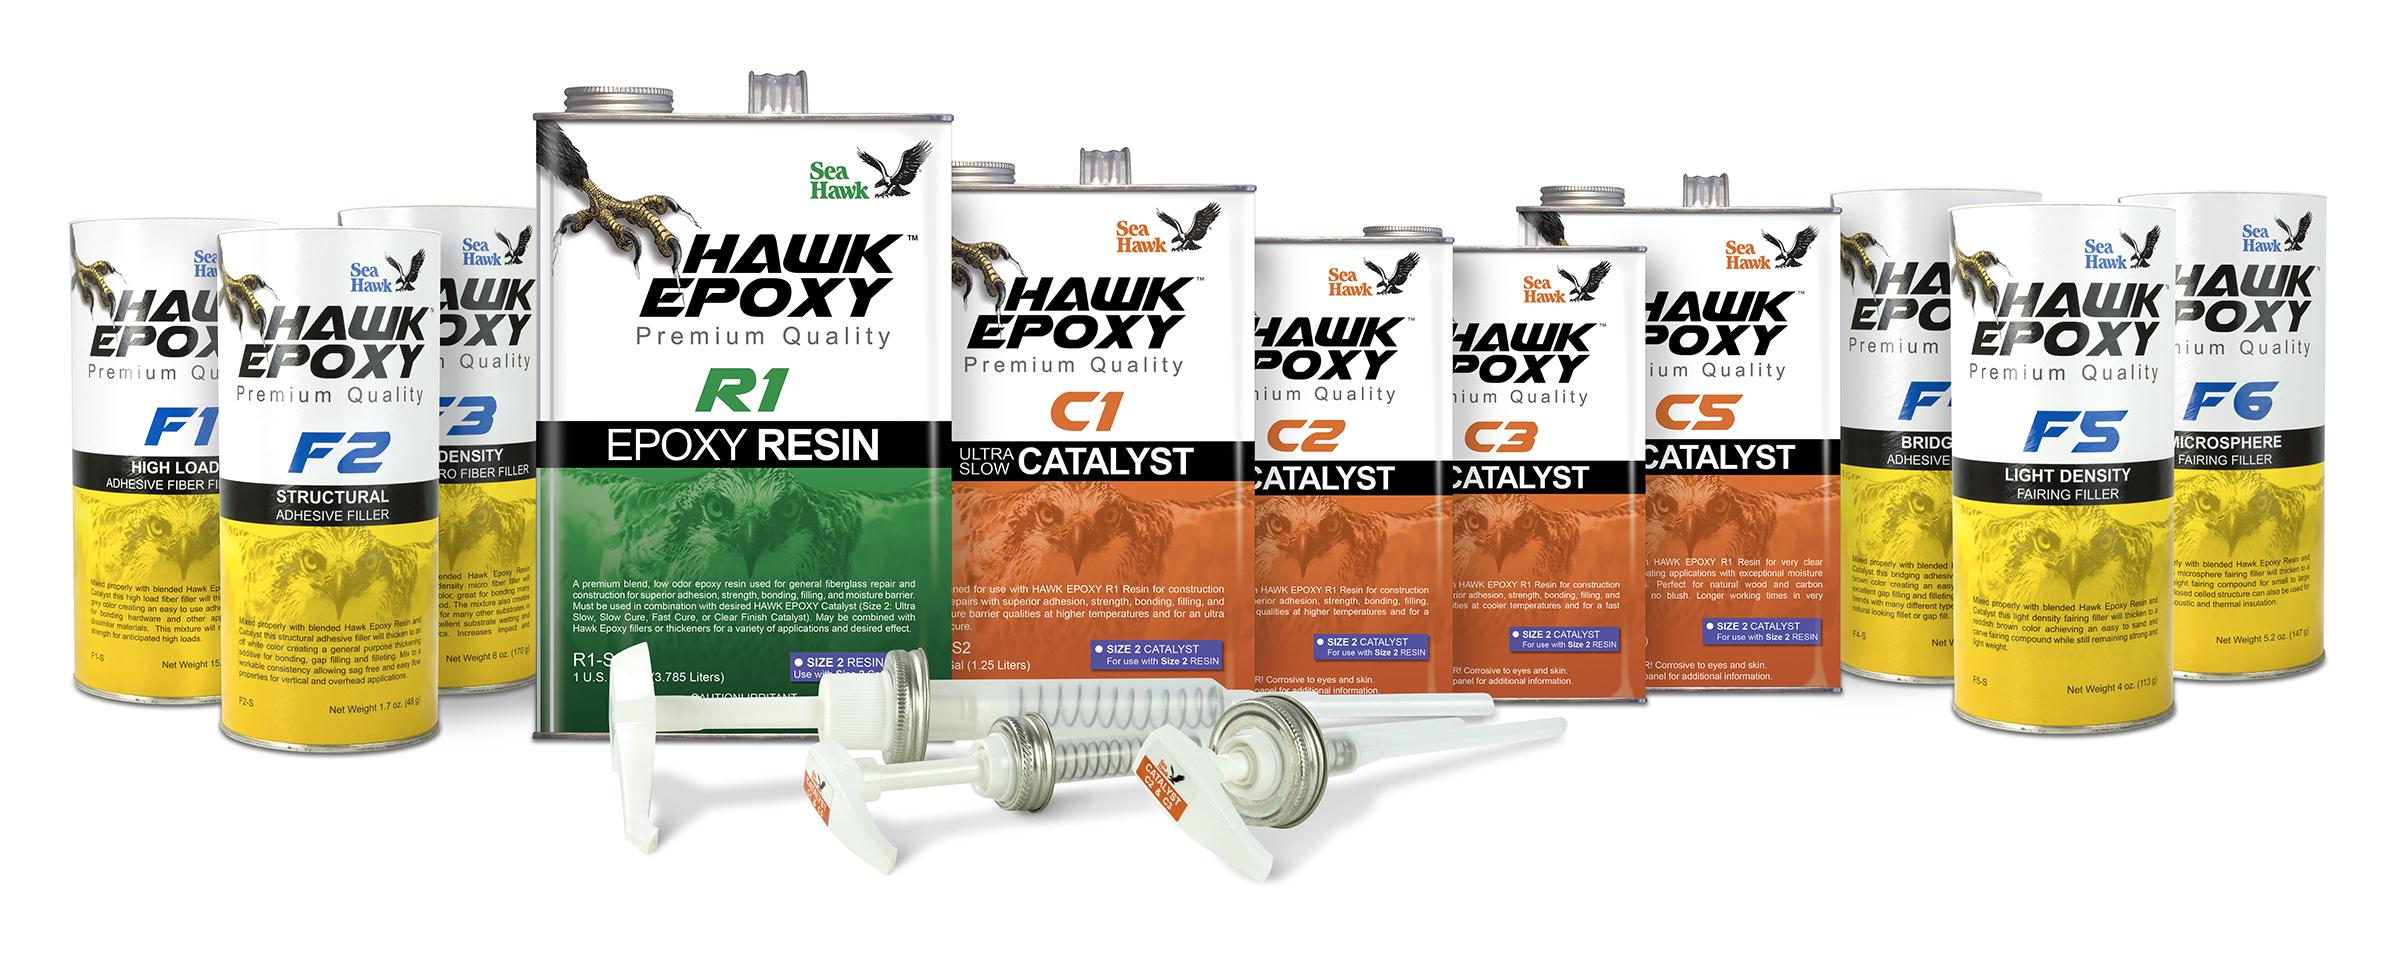 Hawk Epoxy Adds New Distribution Partner to Broaden Its Reach